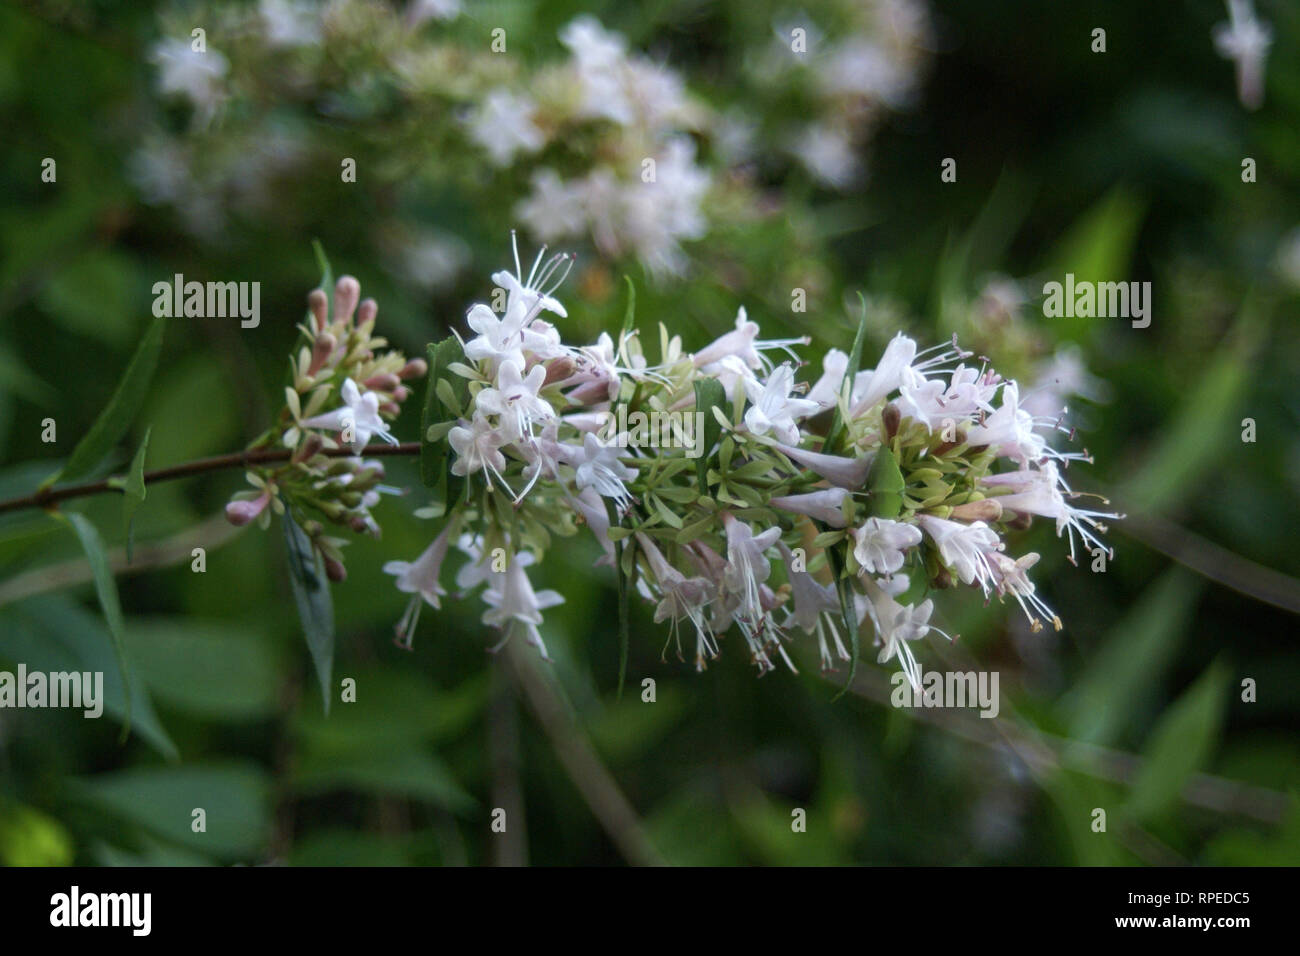 Abelia Chinensis Stock Photo 237575077 Alamy